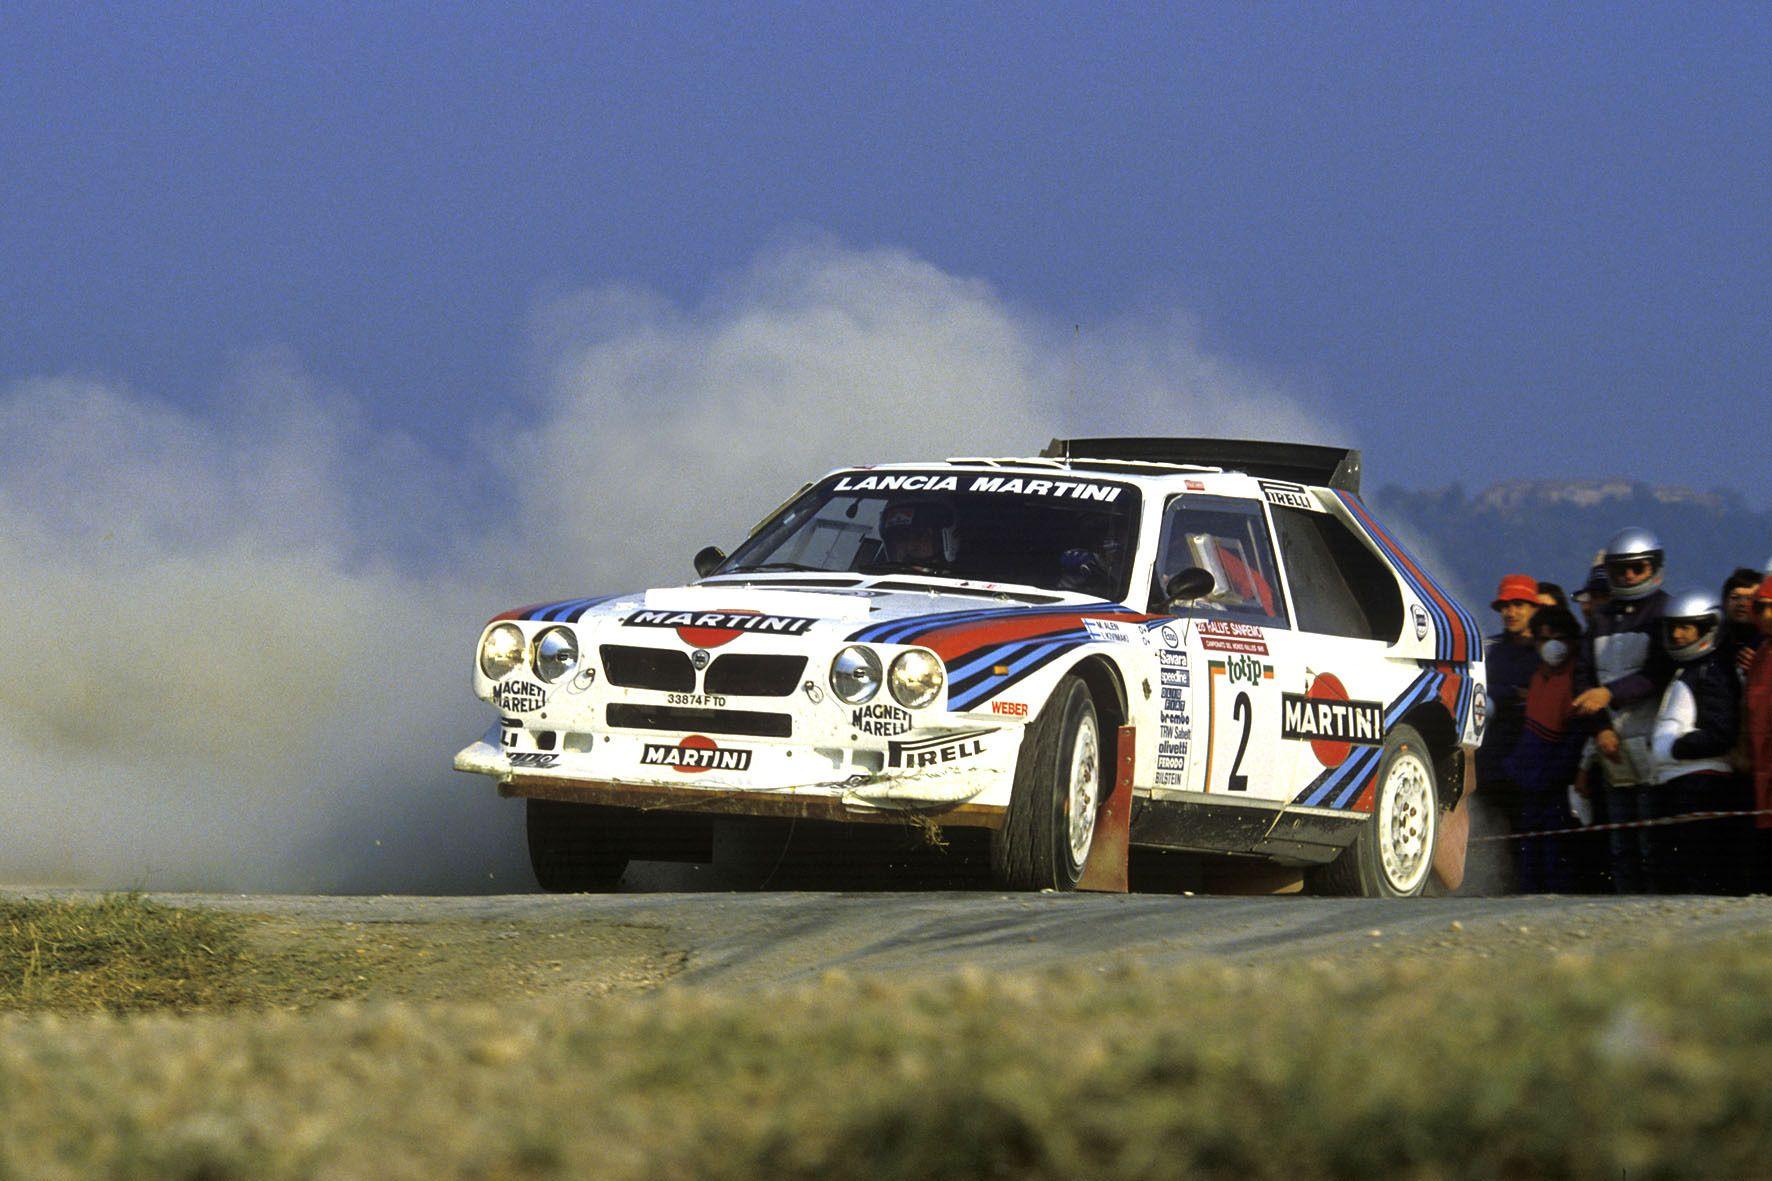 Lancia delta s4 racing cars pinterest lancia delta toyota lancia delta s4 vanachro Choice Image